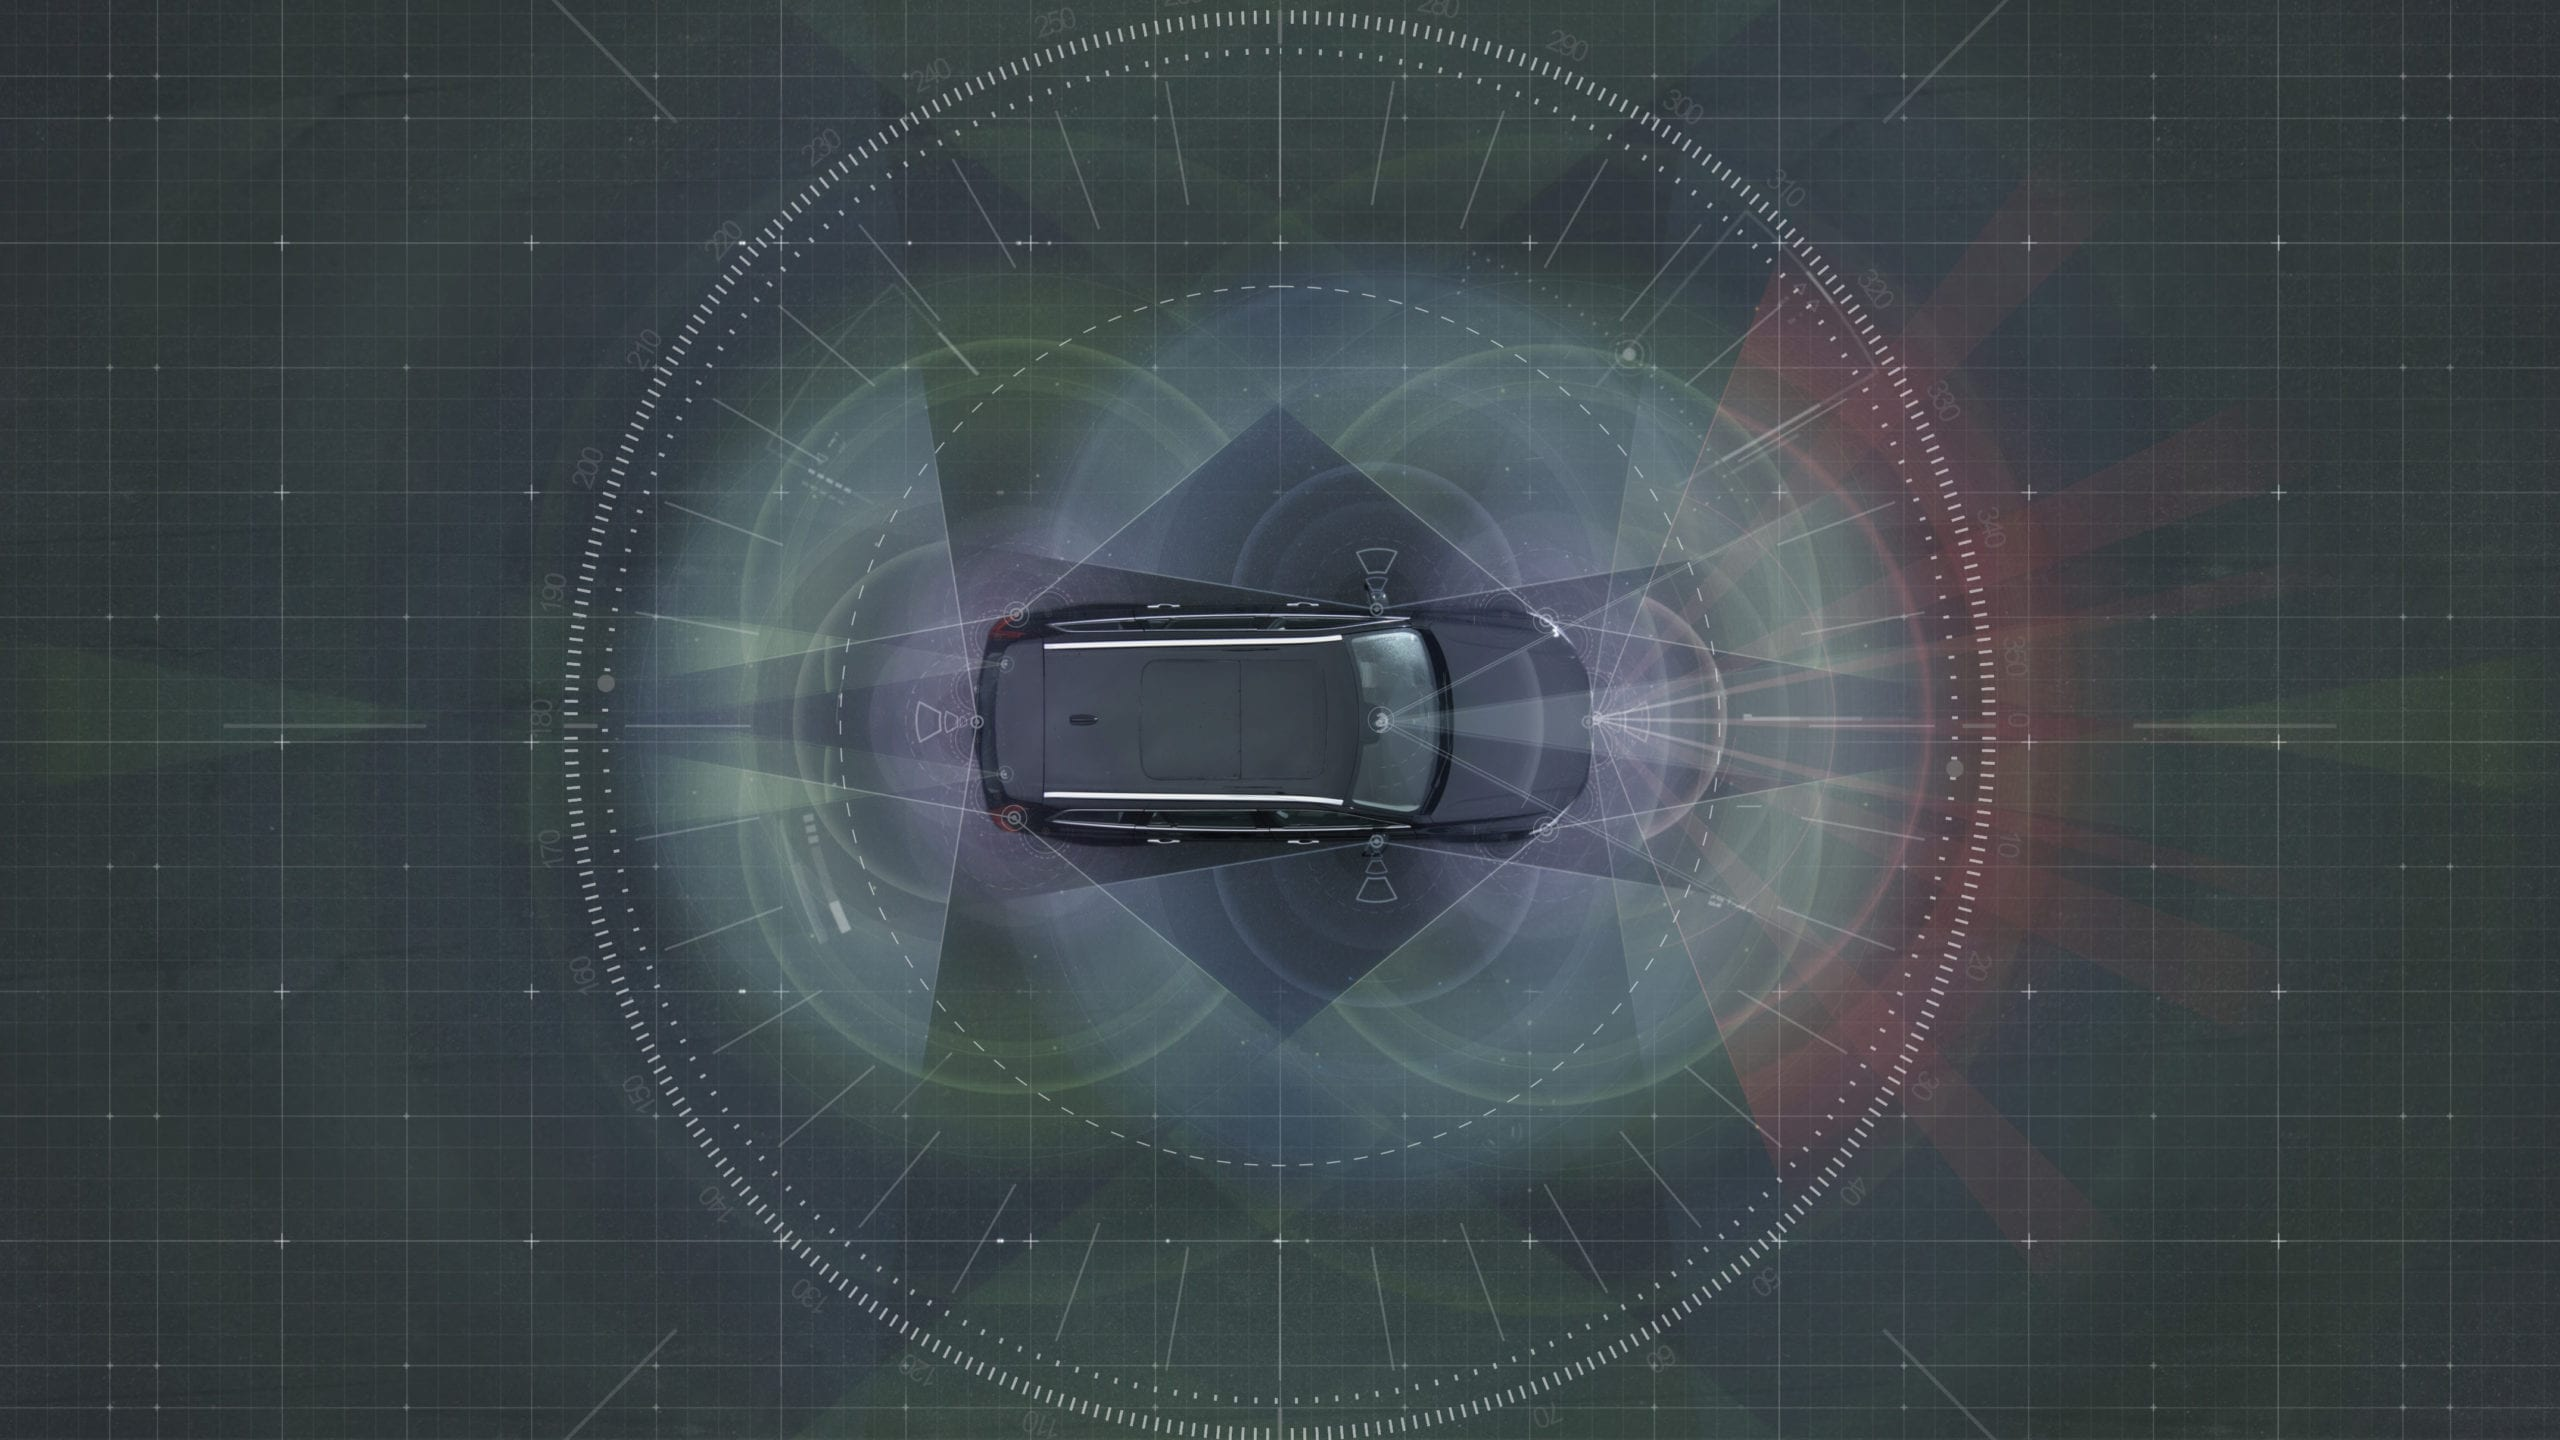 Condução autônoma